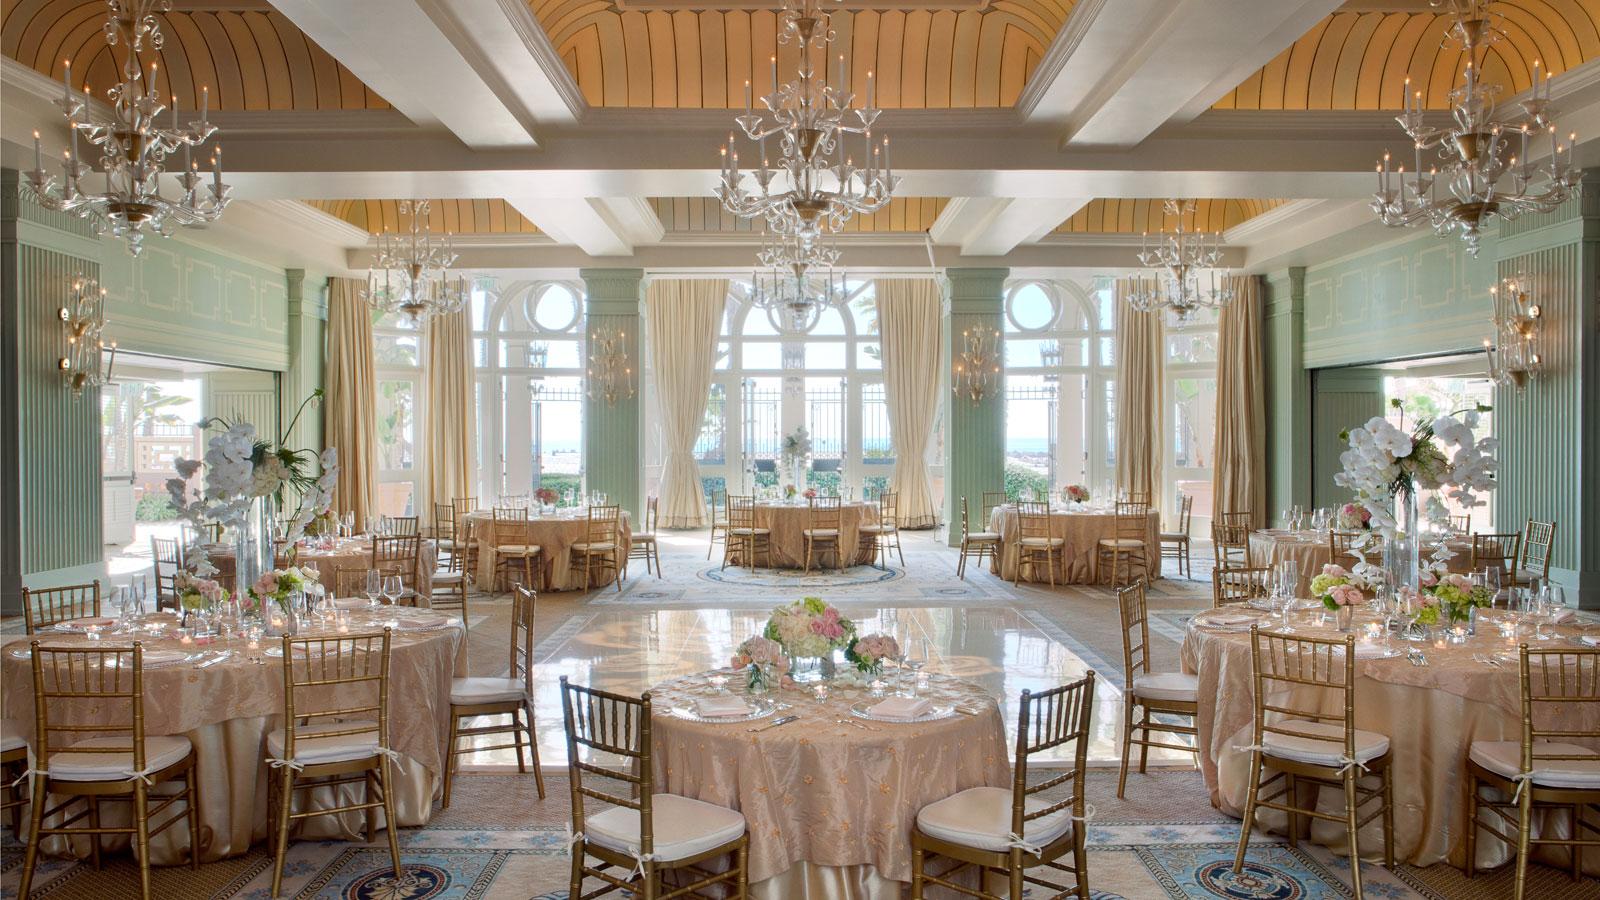 Colonnade ballroom with spa in casa arredamento - Spa in casa arredamento ...